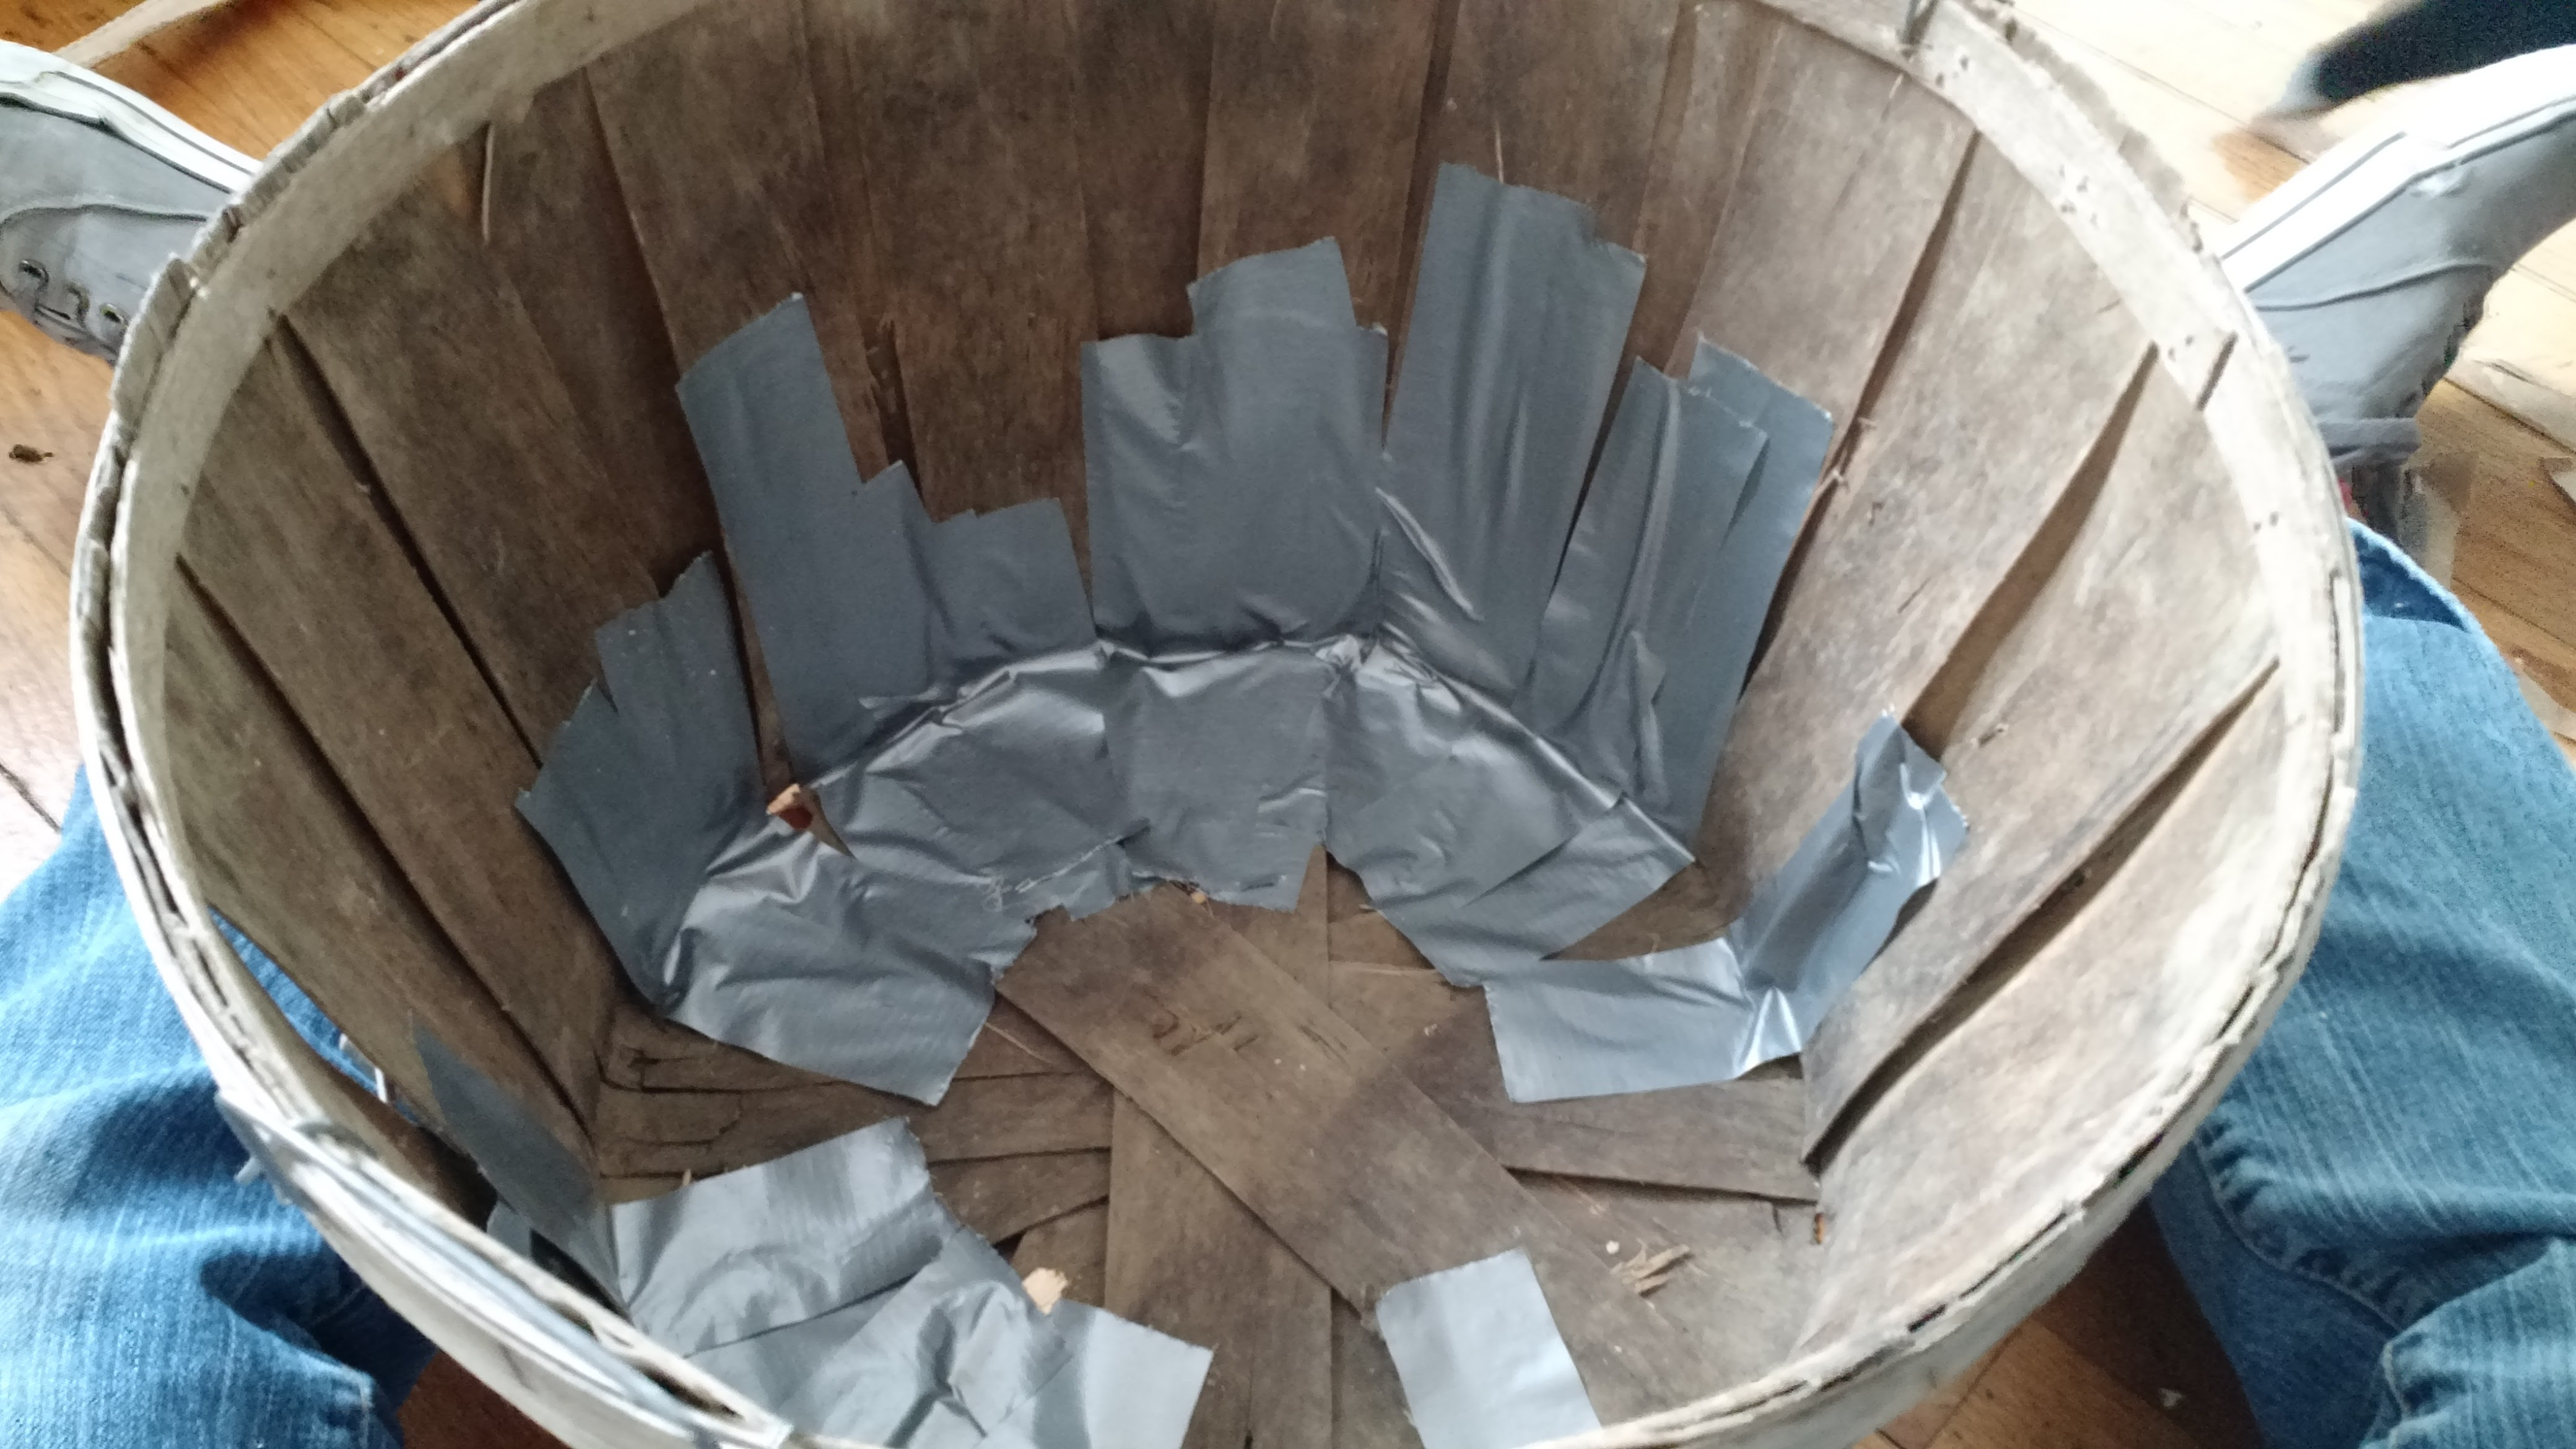 Duct tape work on inside bottom of basket